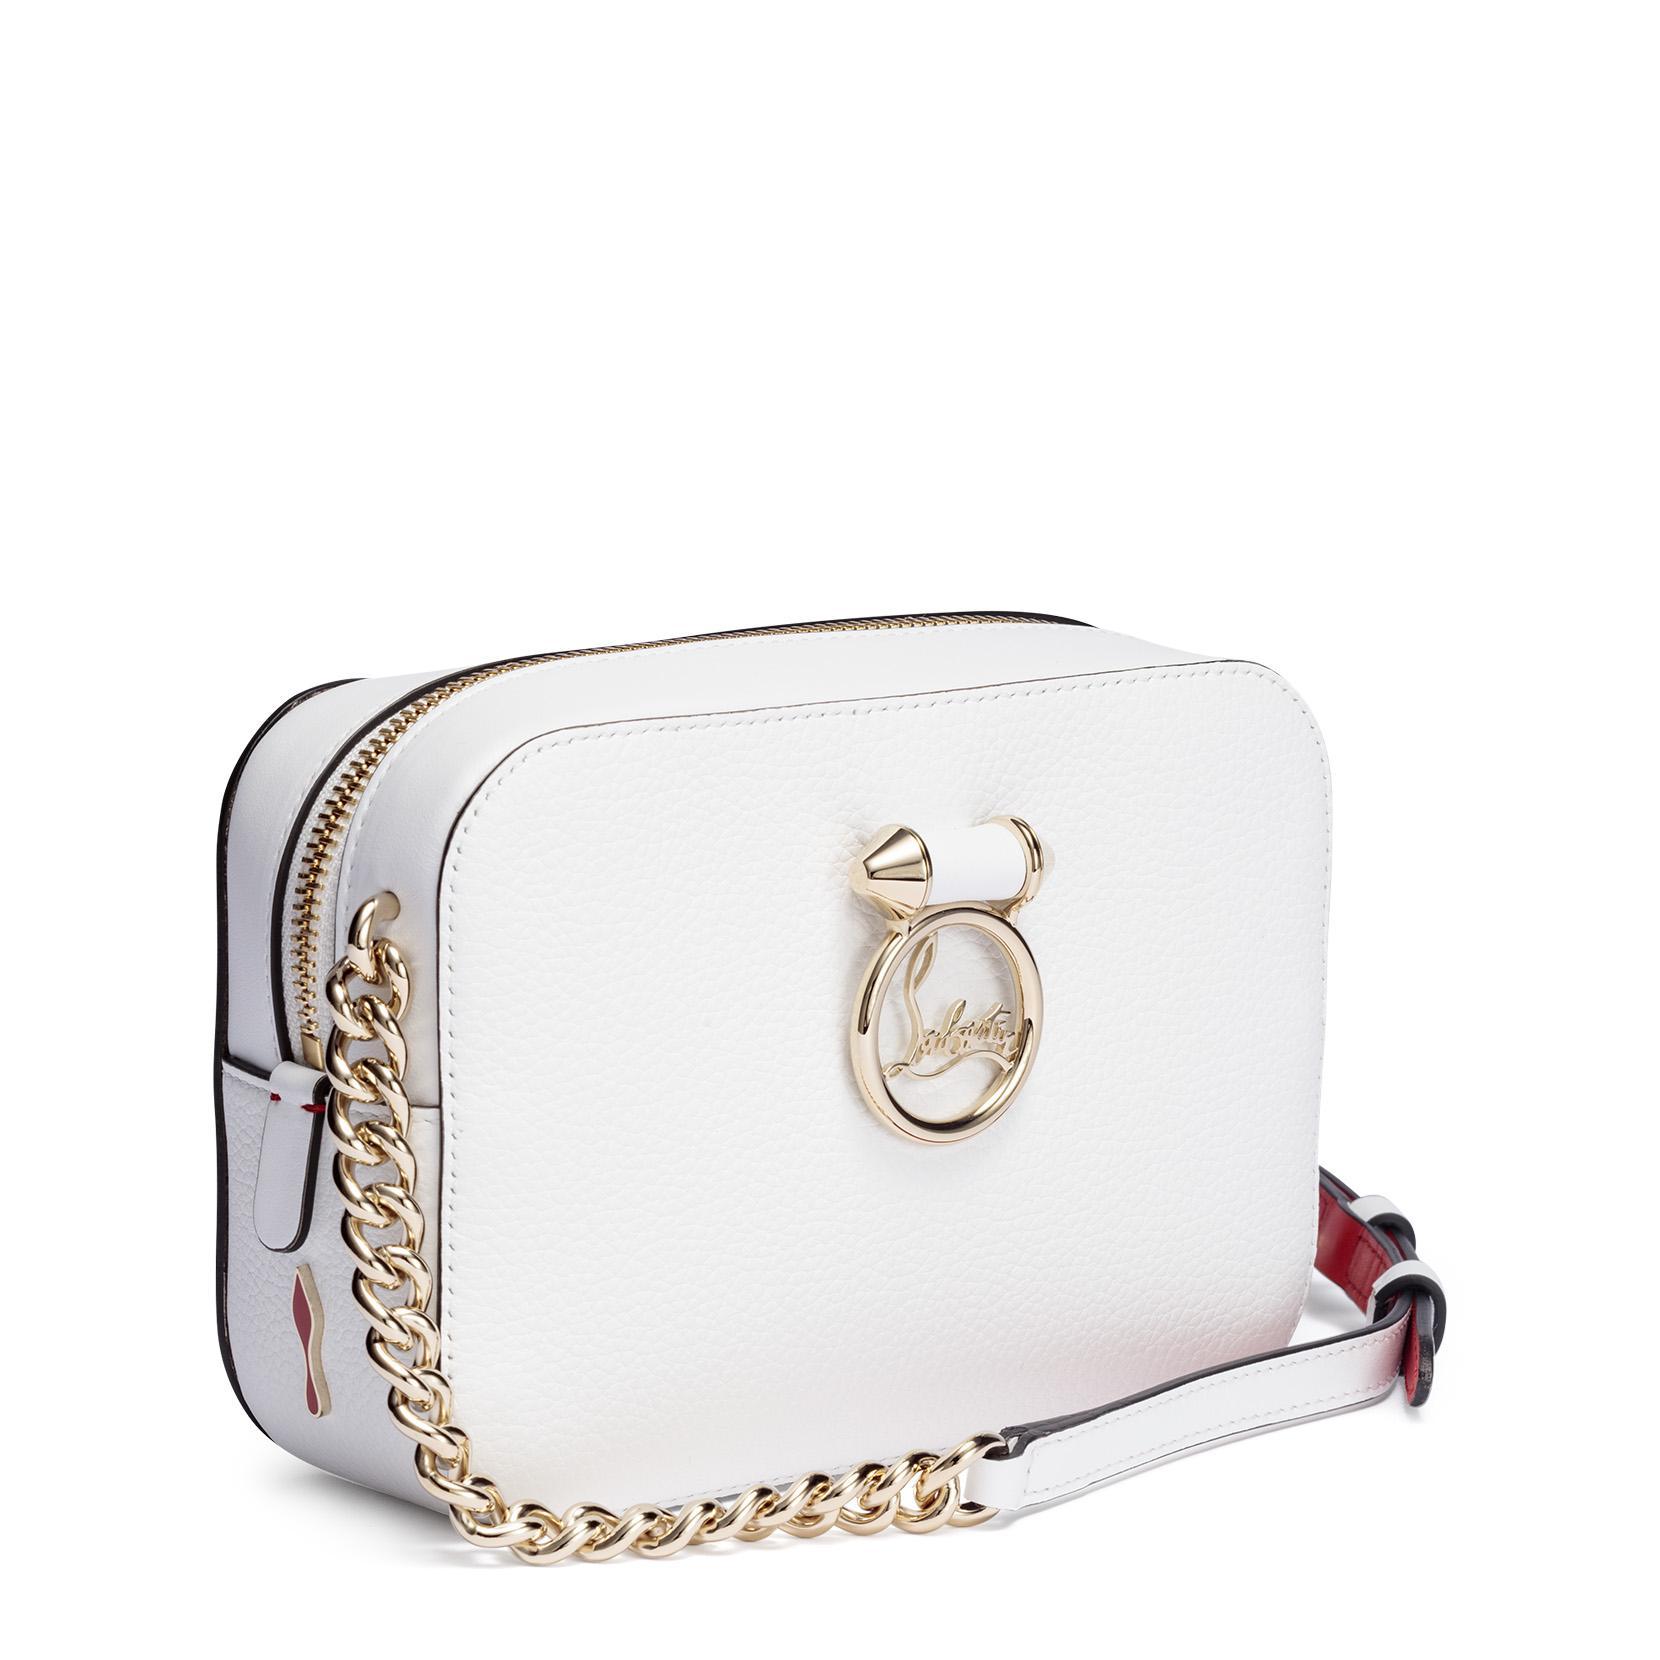 Christian Louboutin Rubylou mini white leather bag 2R0HqJ71i